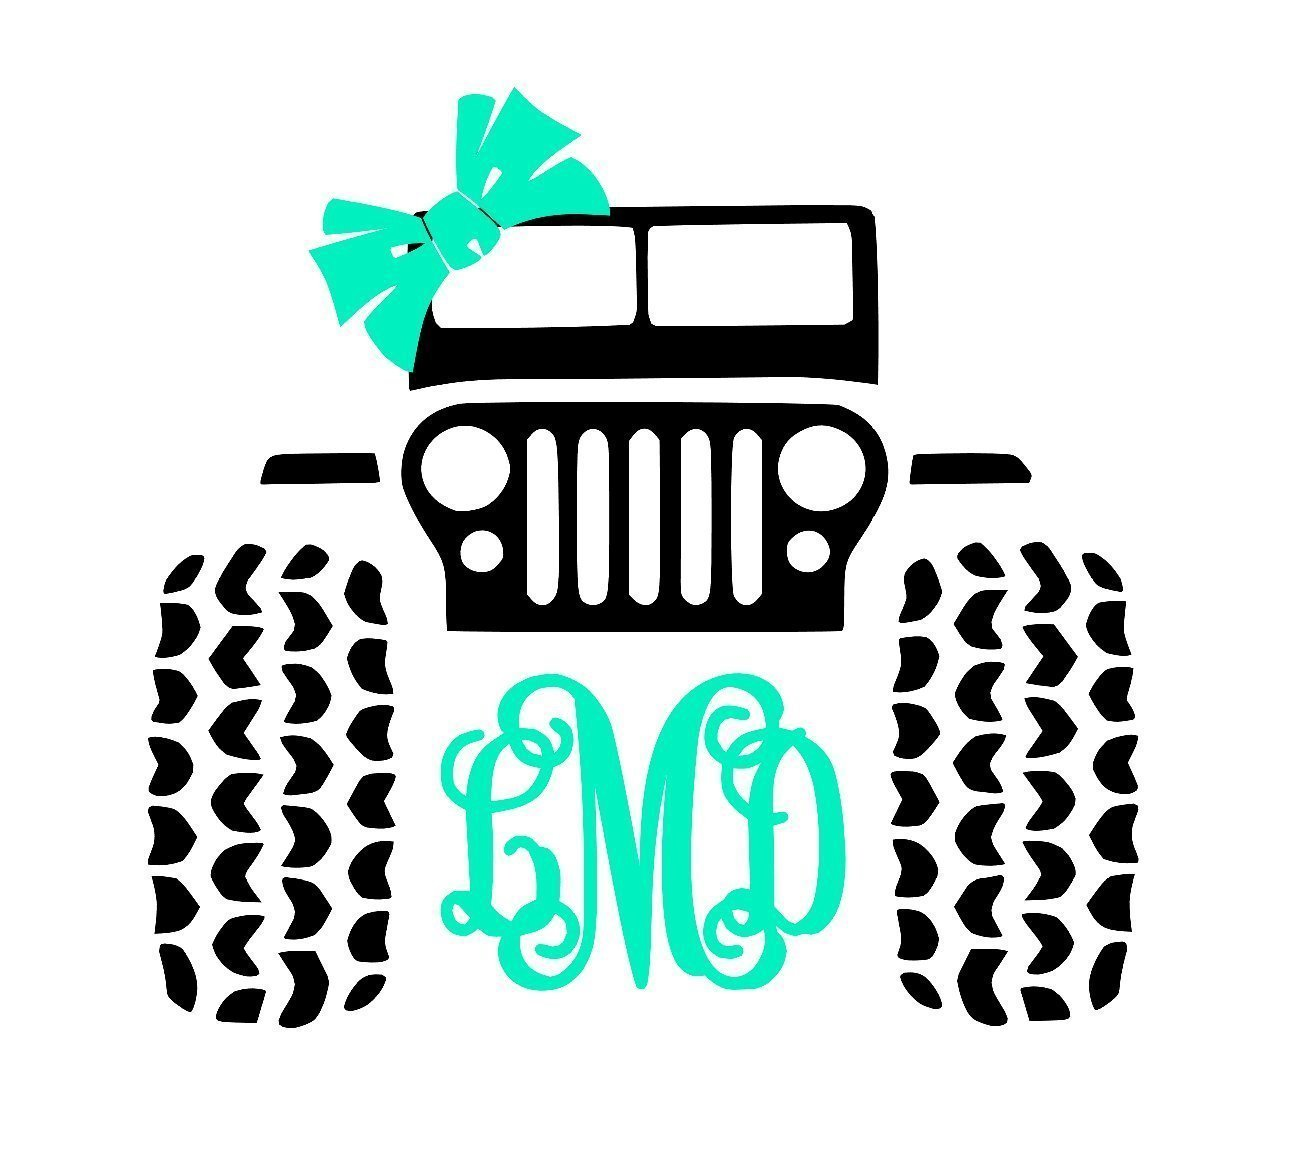 Amazon com custom jeep 4x4 monogram decal sticker for laptop locker car yeti rtic ozark cooler tumbler or cup handmade